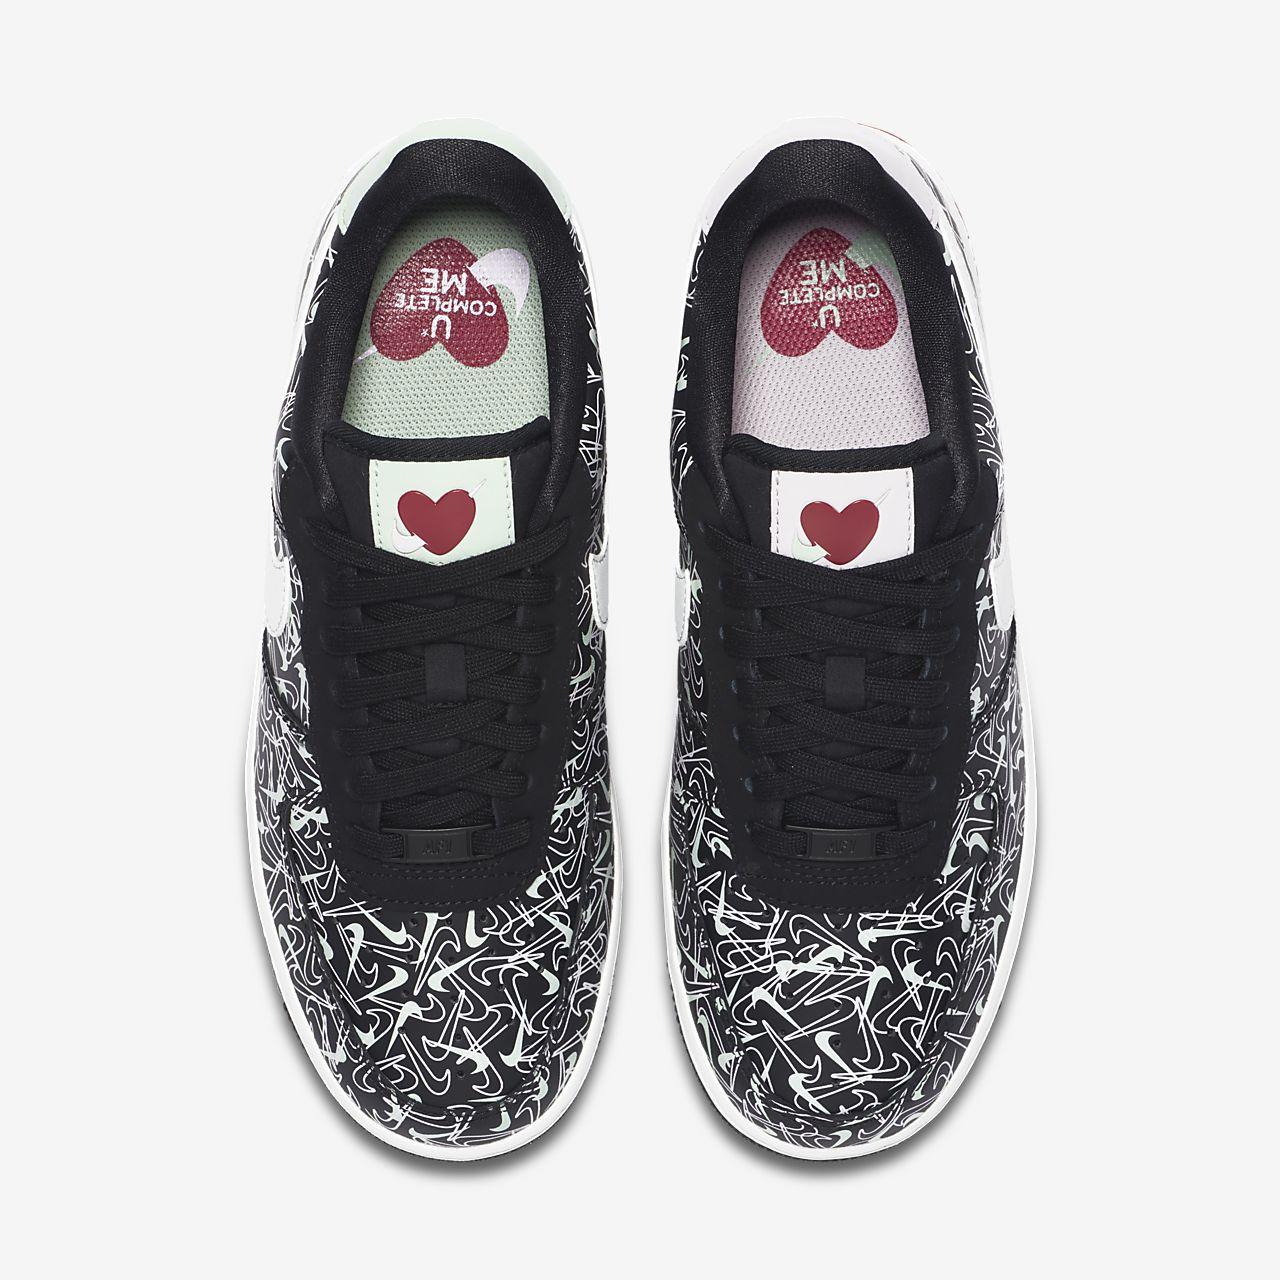 Nike Air Force 1 '07 Premium SE Damesschoen Valentijnsdag